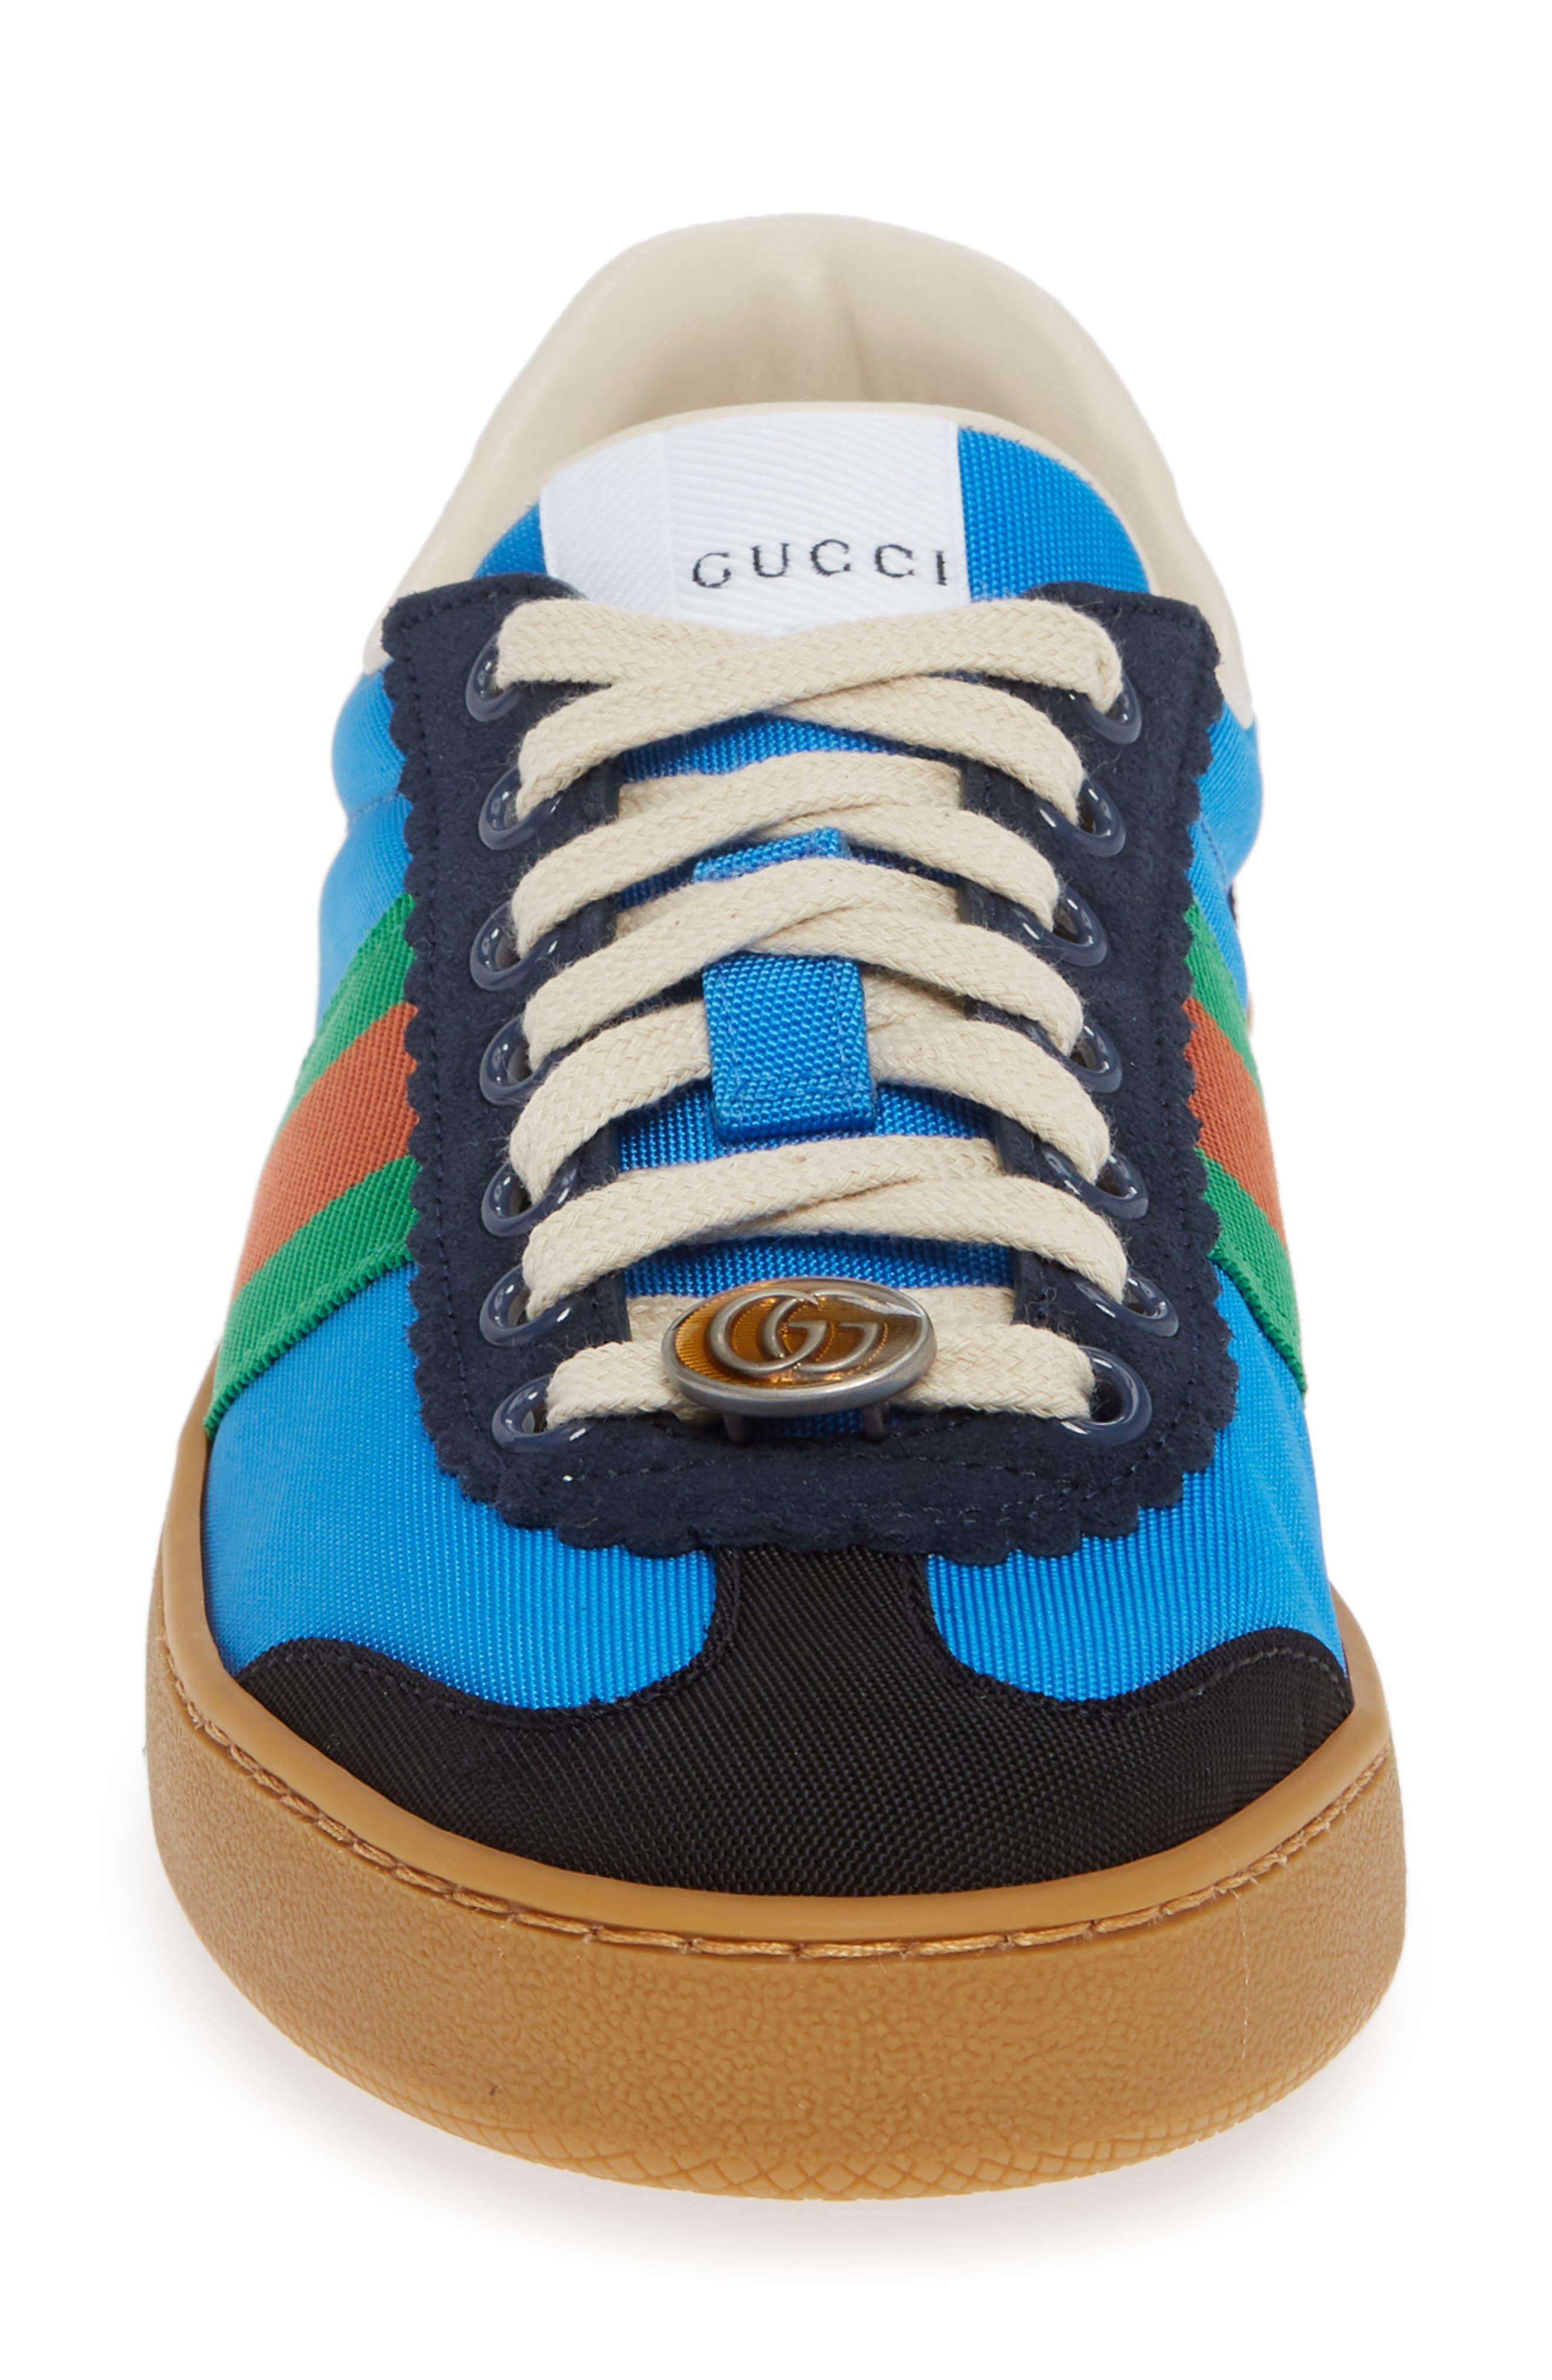 GUCCI, G74 Low Top Sneaker, Alternate thumbnail 4, color, 400